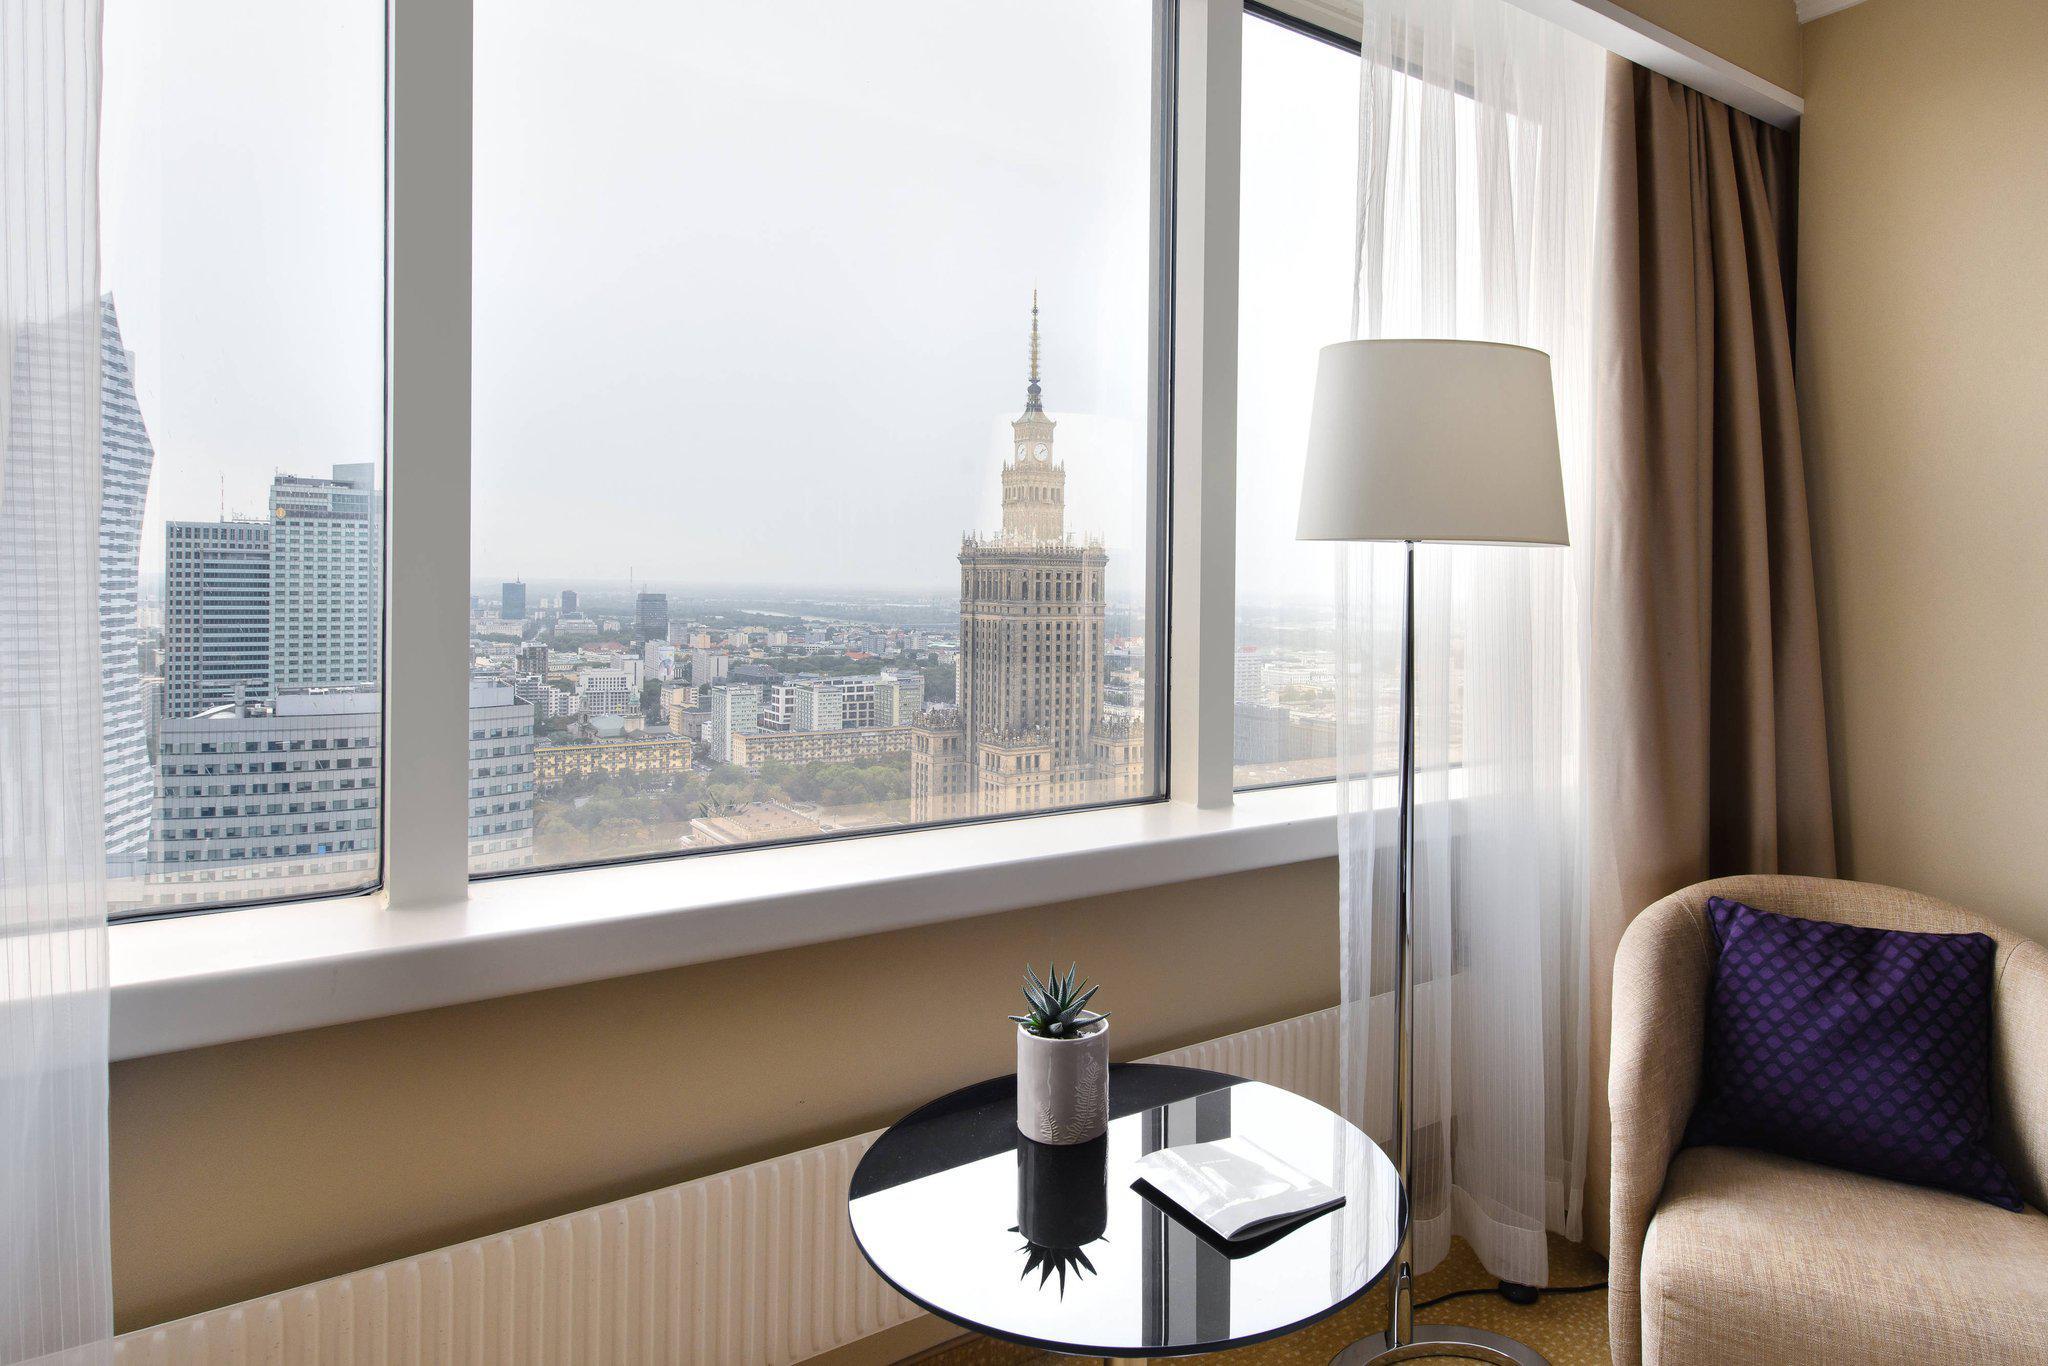 Warsaw Marriott Hotel